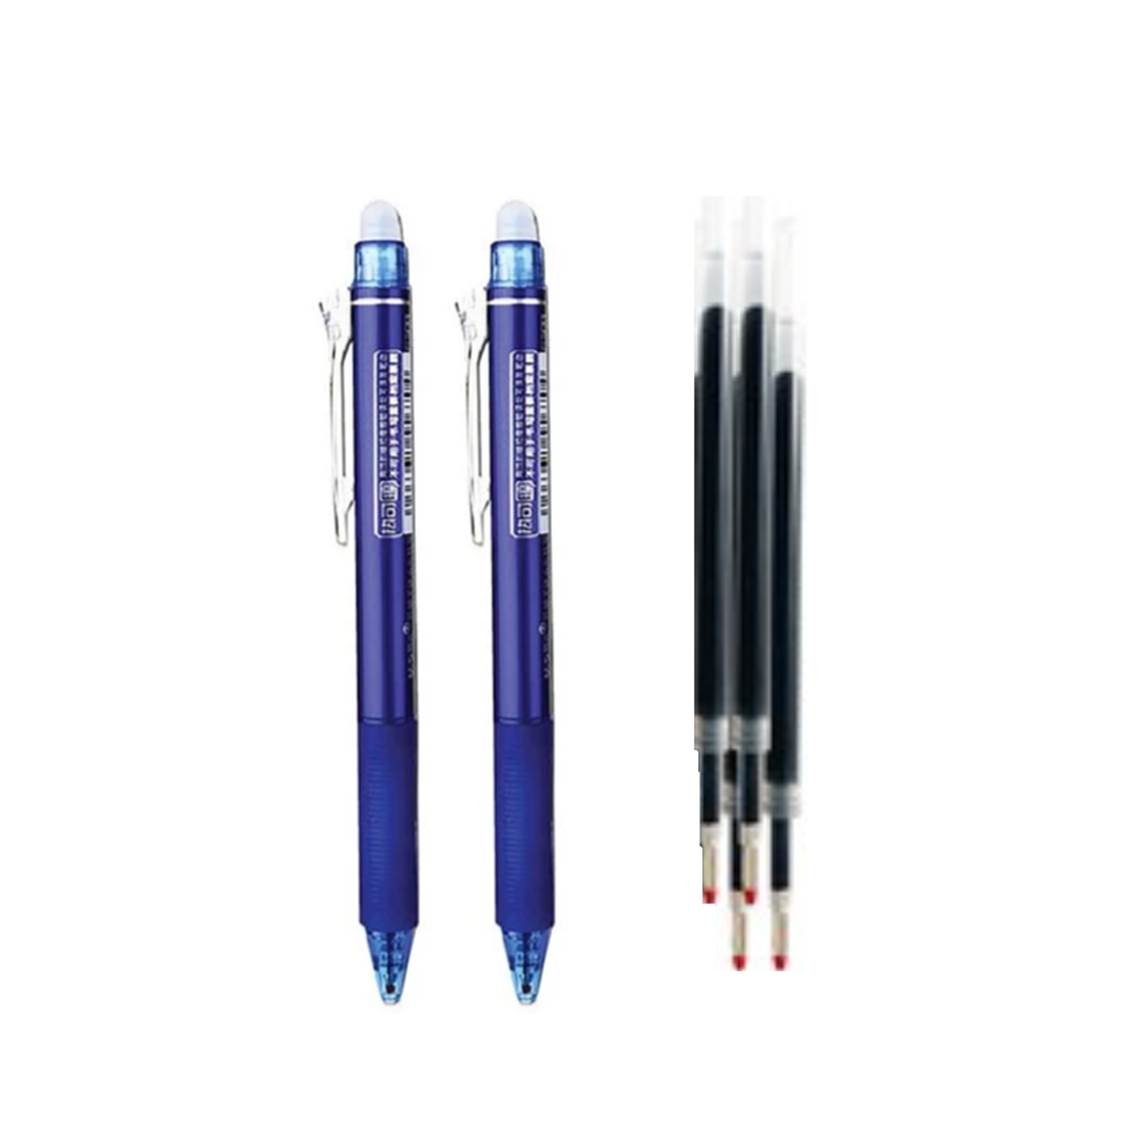 M&G 晨光筆套裝-藍(2筆+4芯)